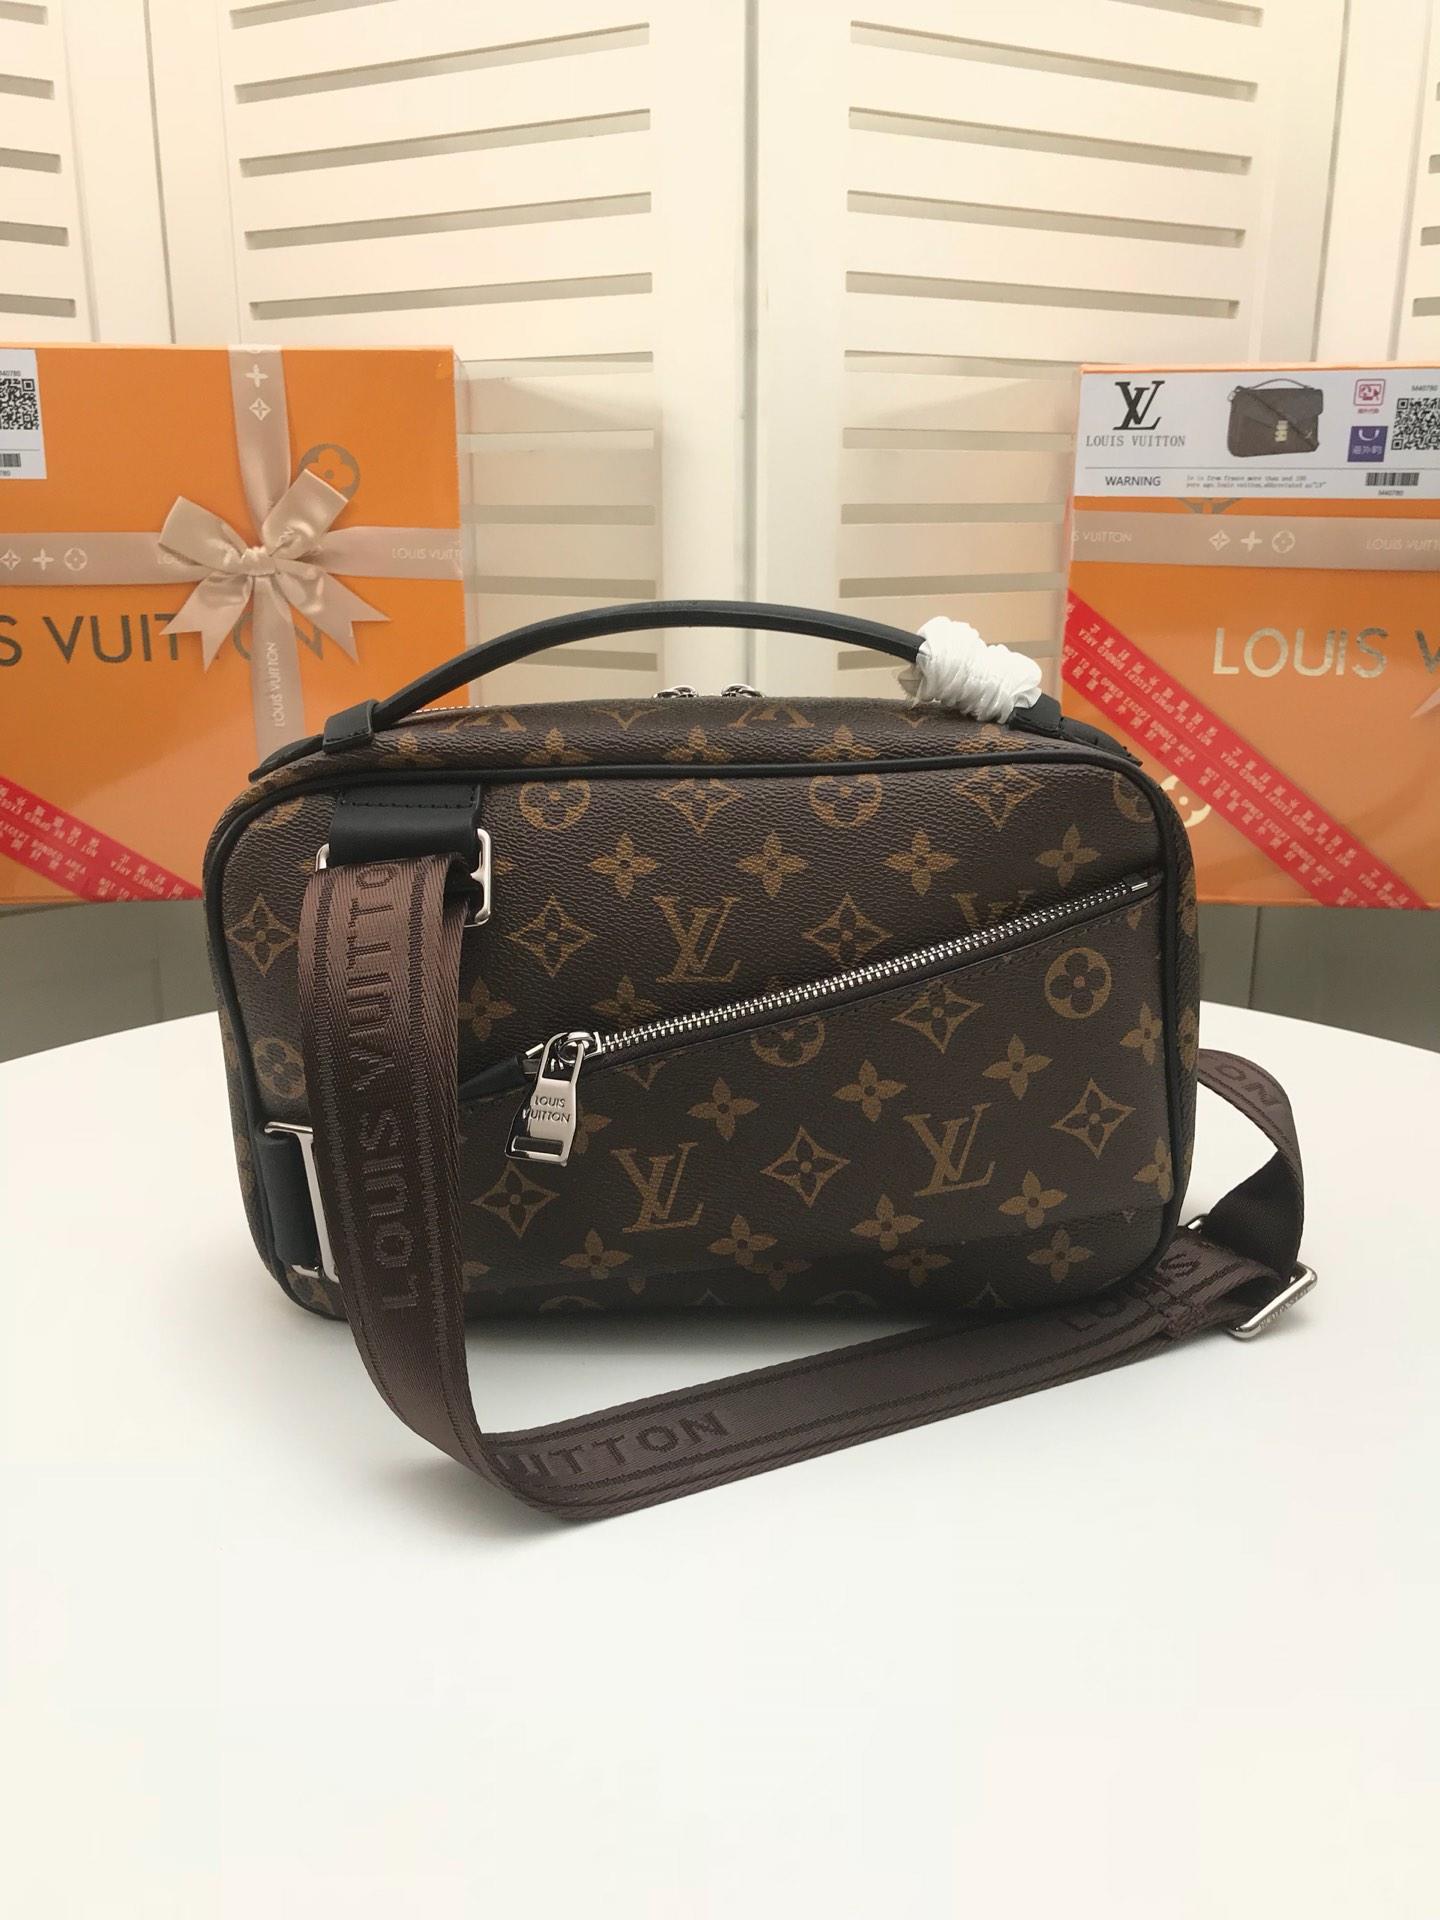 Louis Vuitton ルイヴィトン メンズ ウェストバッグ 2色 安全必ず届く 代引き可能  M42906